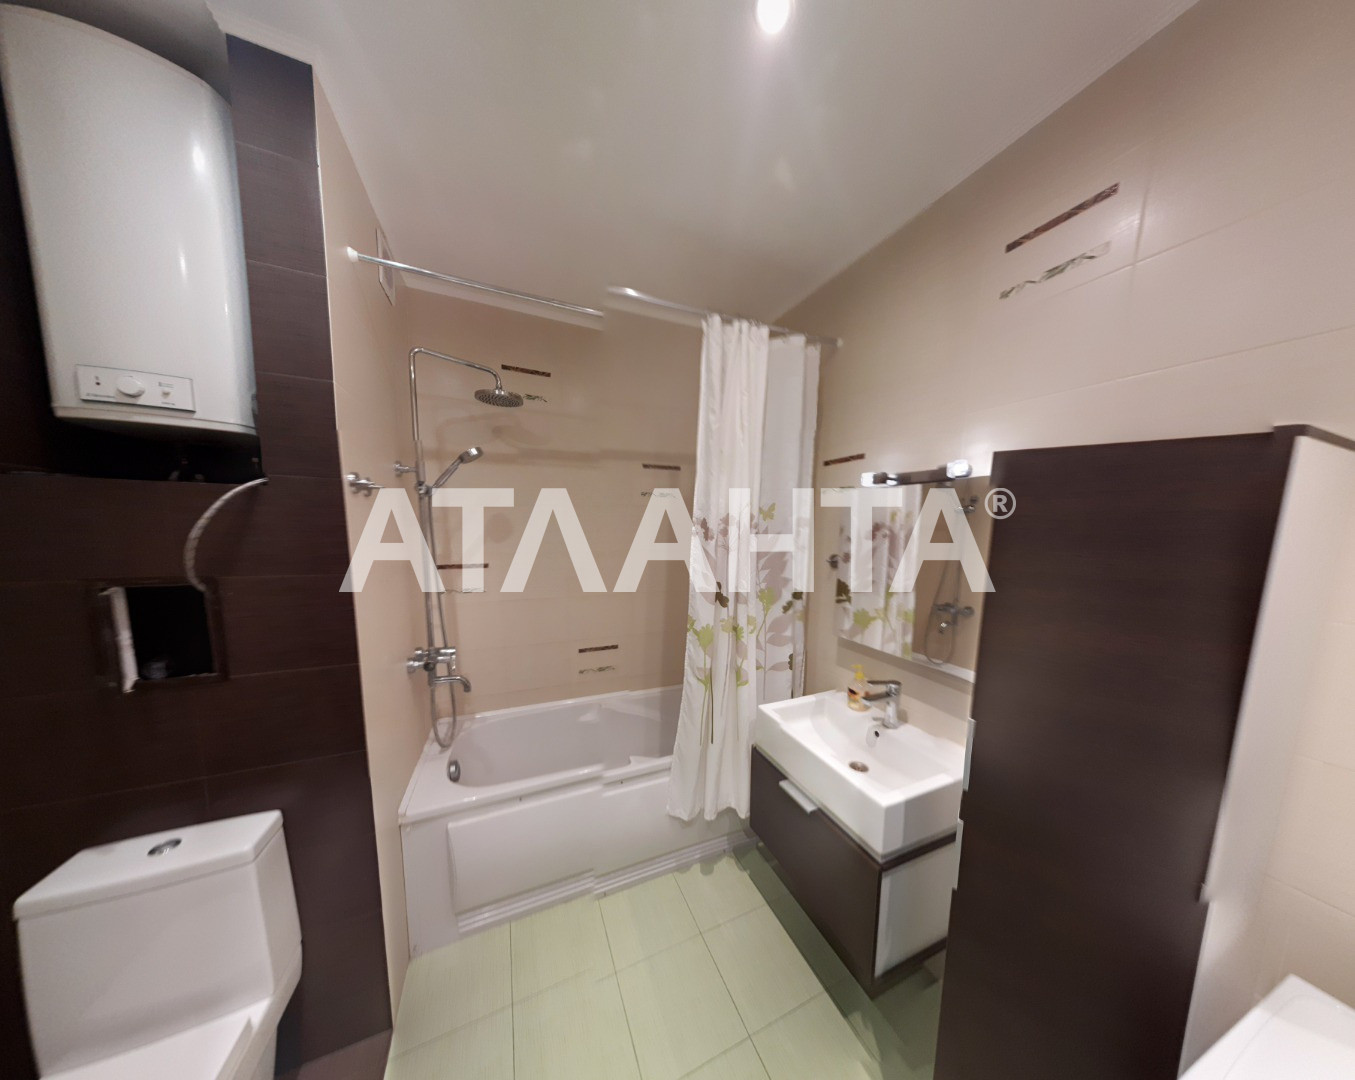 Продается 1-комнатная Квартира на ул. Ул. Мейтуса — 82 000 у.е. (фото №22)